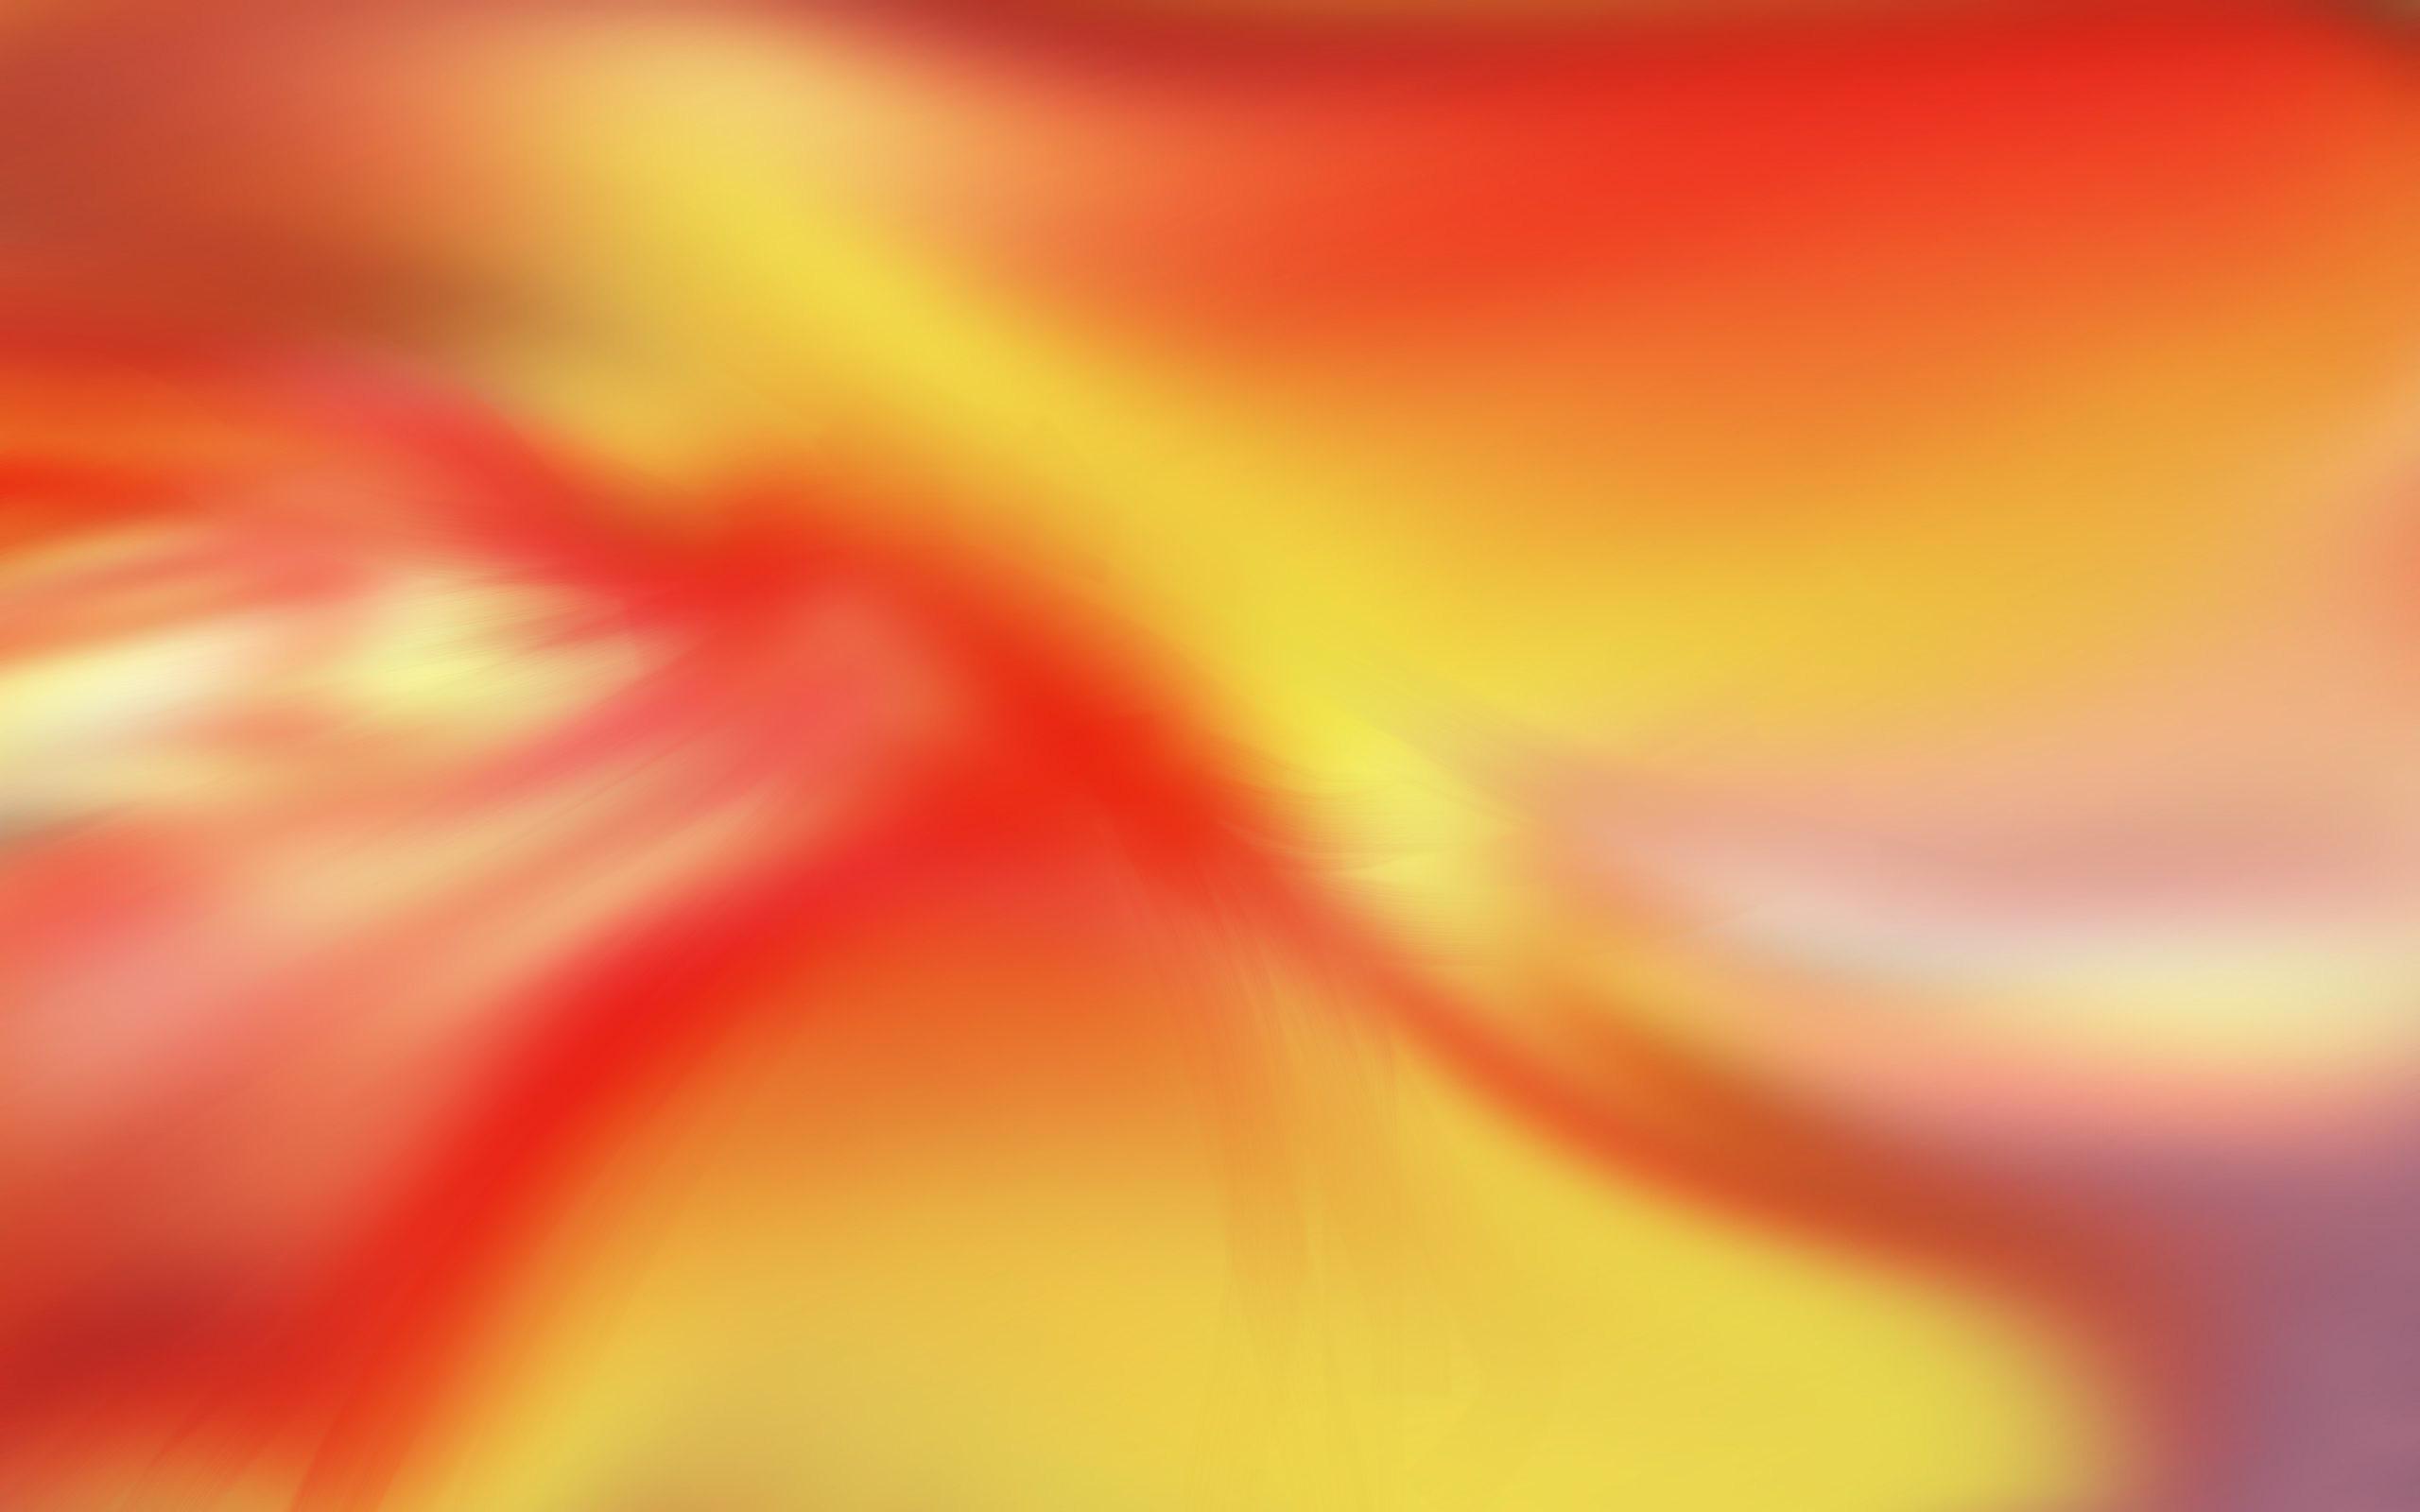 Satin Wallpaper 1600x1200 10964